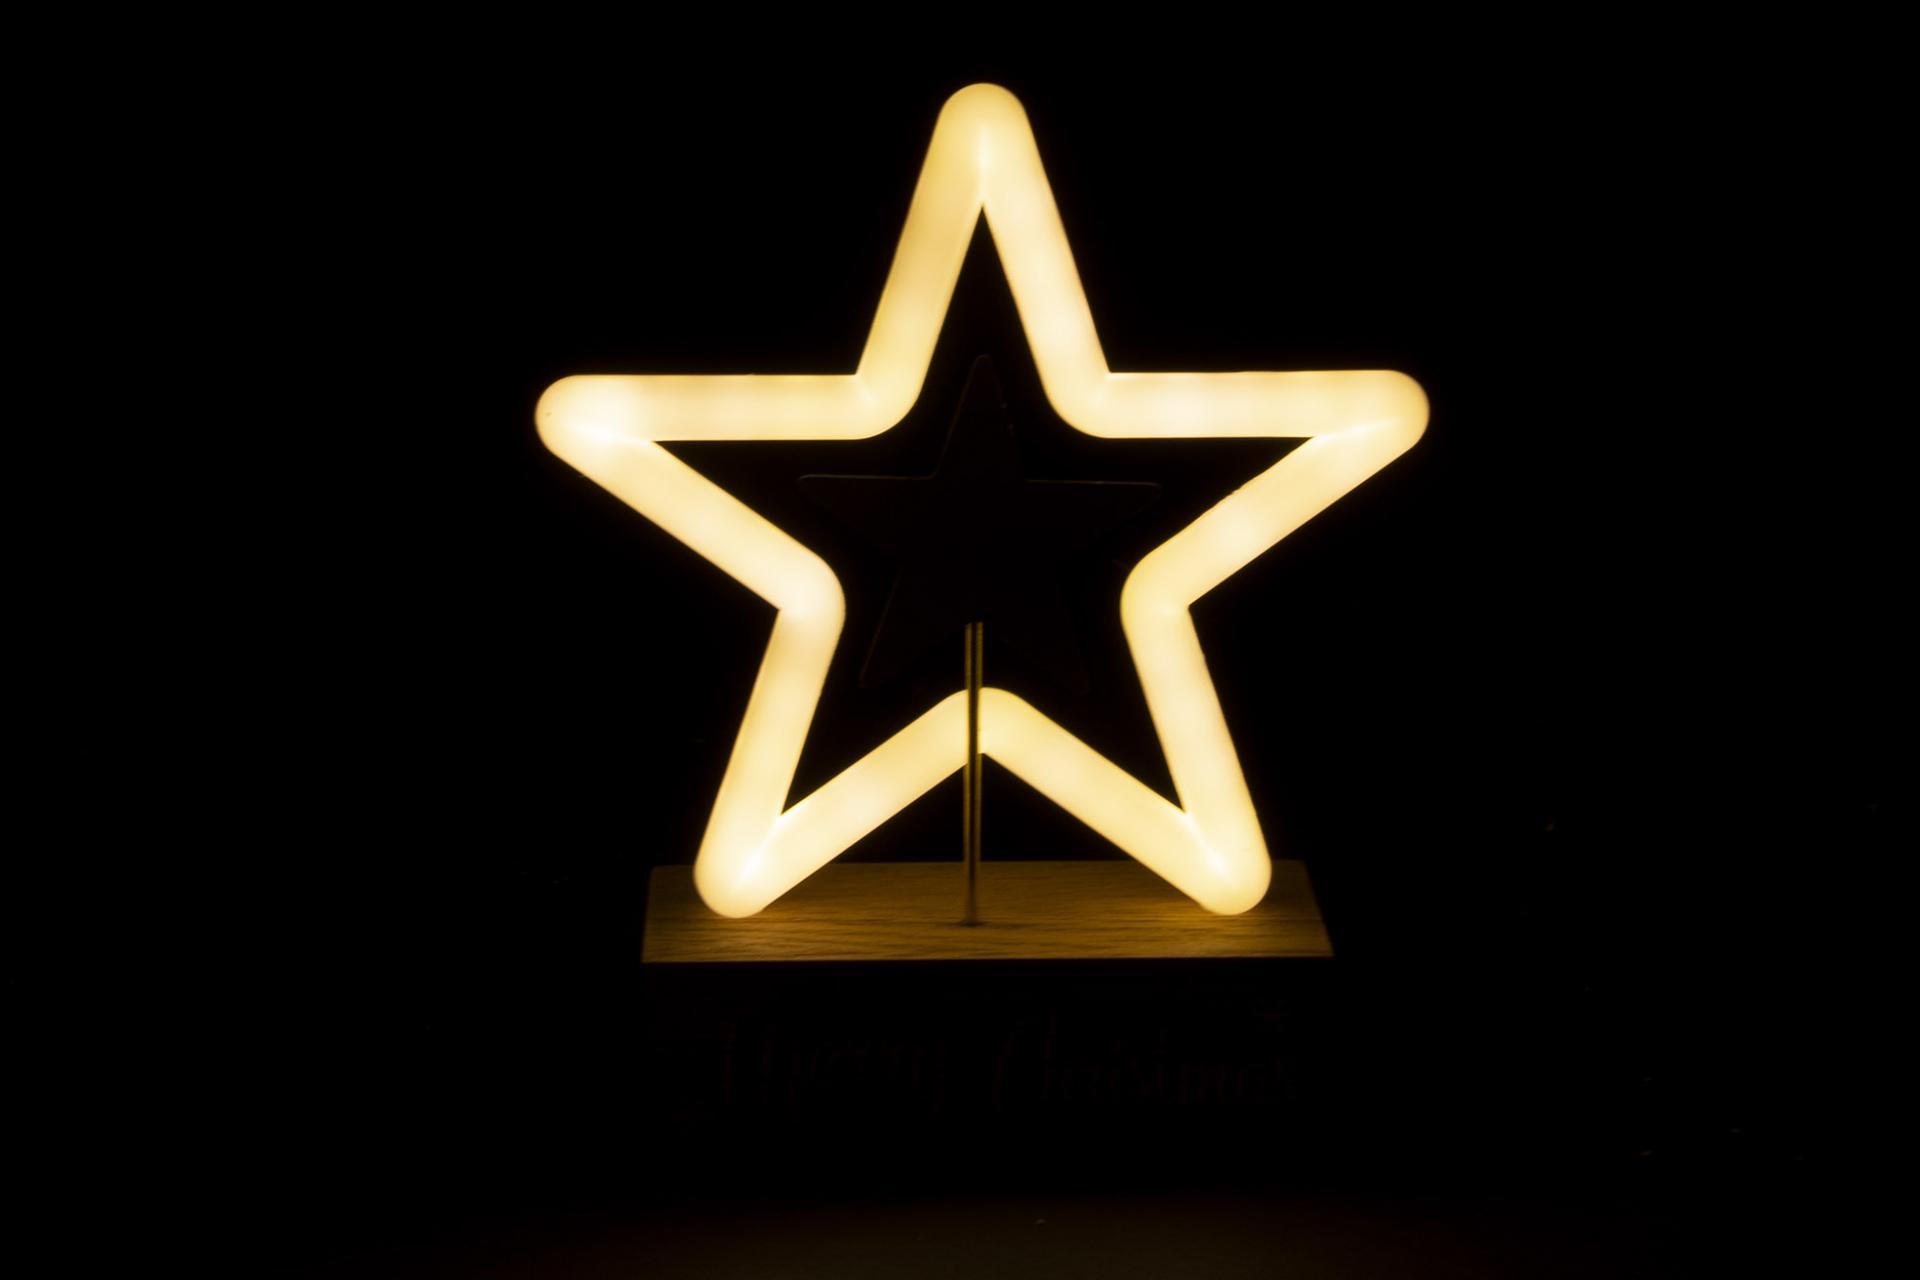 DECORACION LUMINOSA LED ESTRELLA 15,5X6X18 (ITEM INTERNATIONAL)